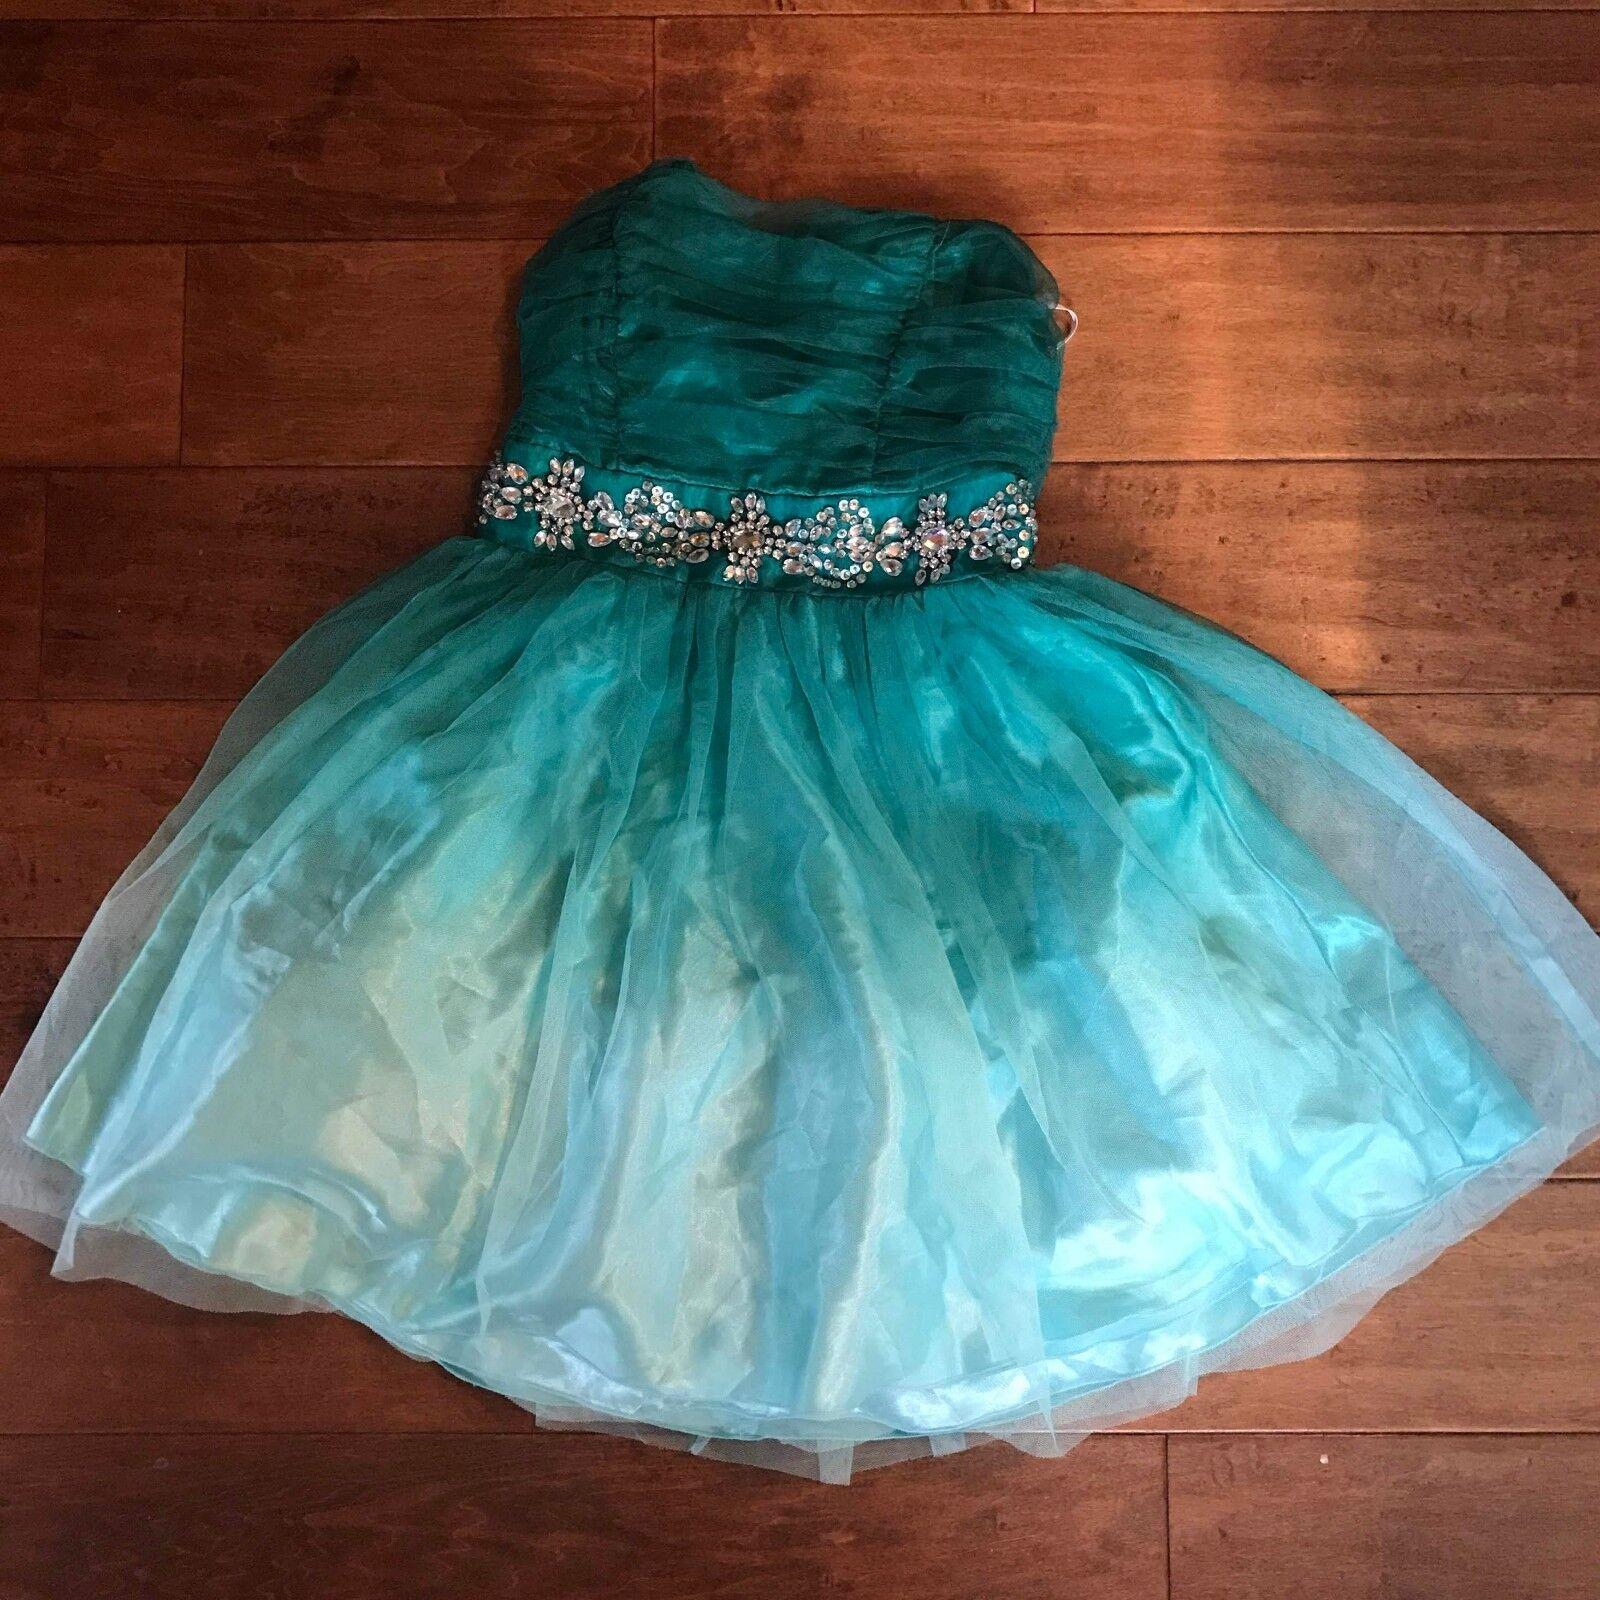 B Darlin Jr Dress Size 1 2 Jade Green Strapless Ombre A-Line Jeweled Formal